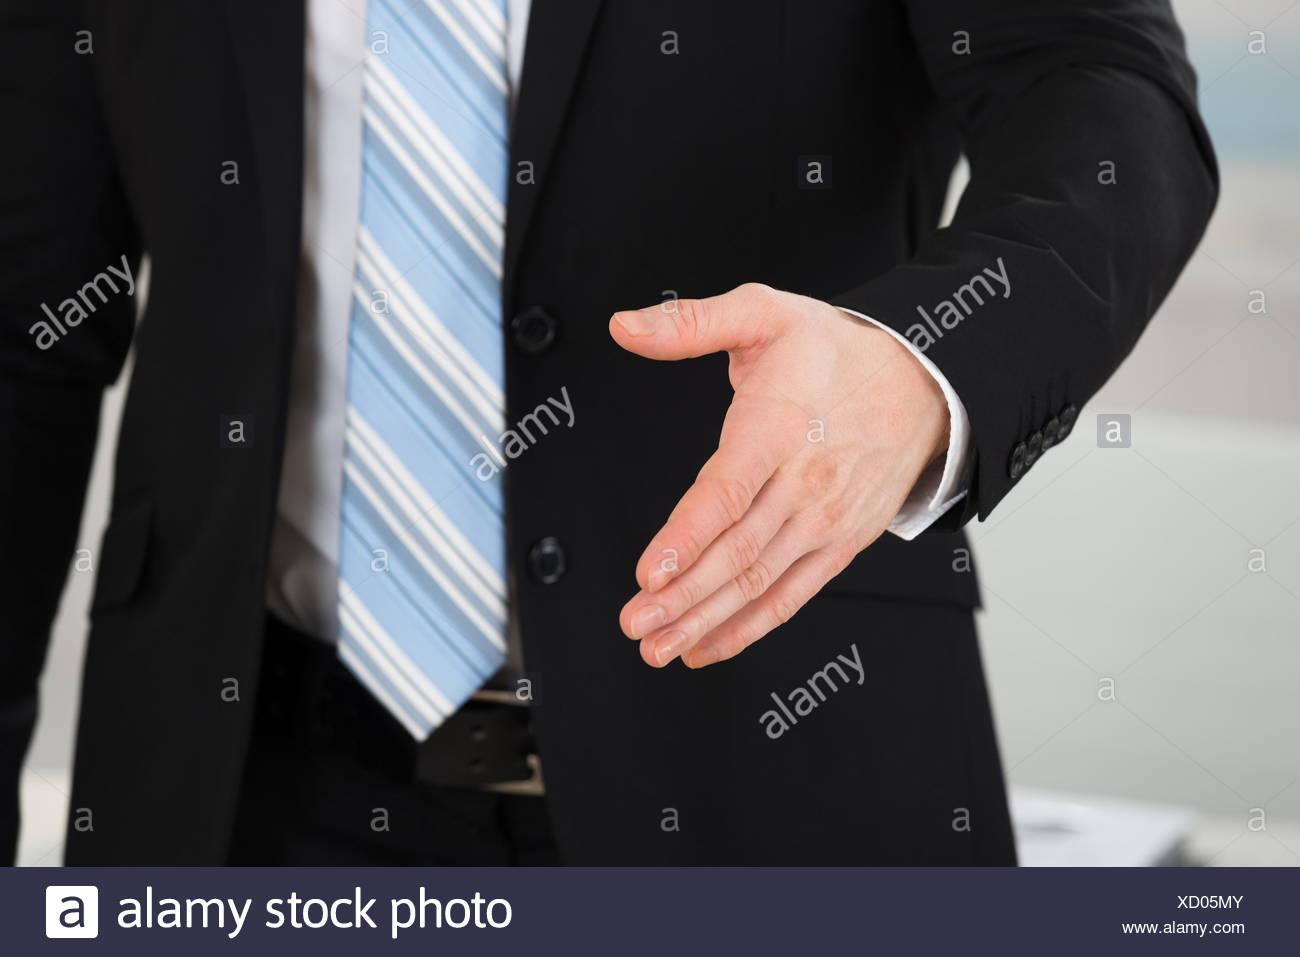 Businessman Offering Handshake In Office - Stock Image